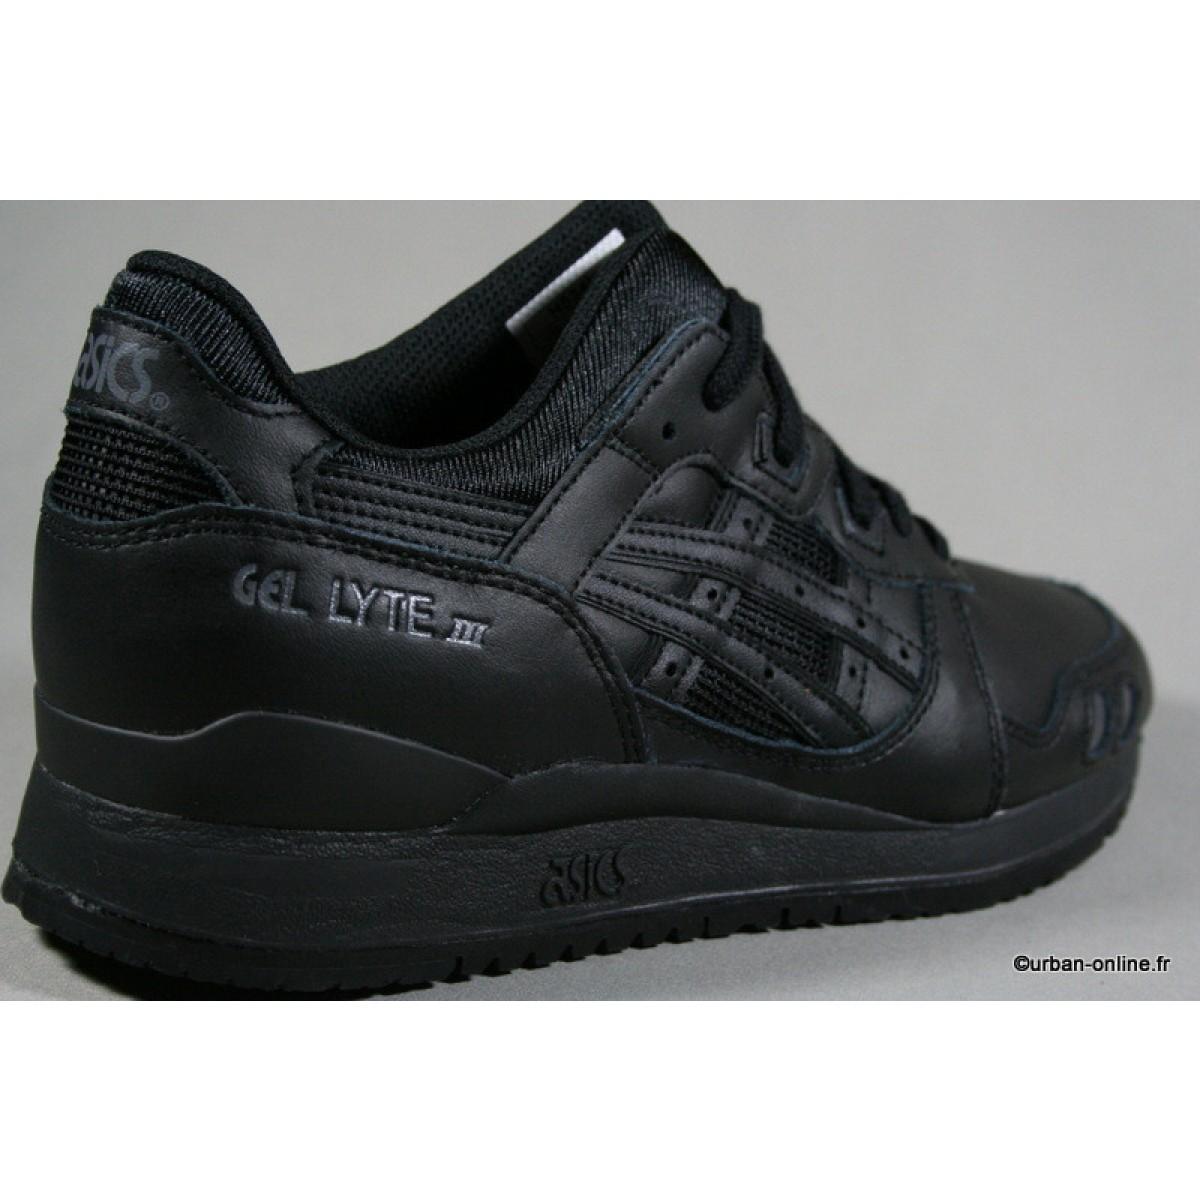 watch a8734 23521 Achat   Vente produits Asics Gel Lyte 3 Femme Noir,Professionnel Courir  Chaussures Asics Gel